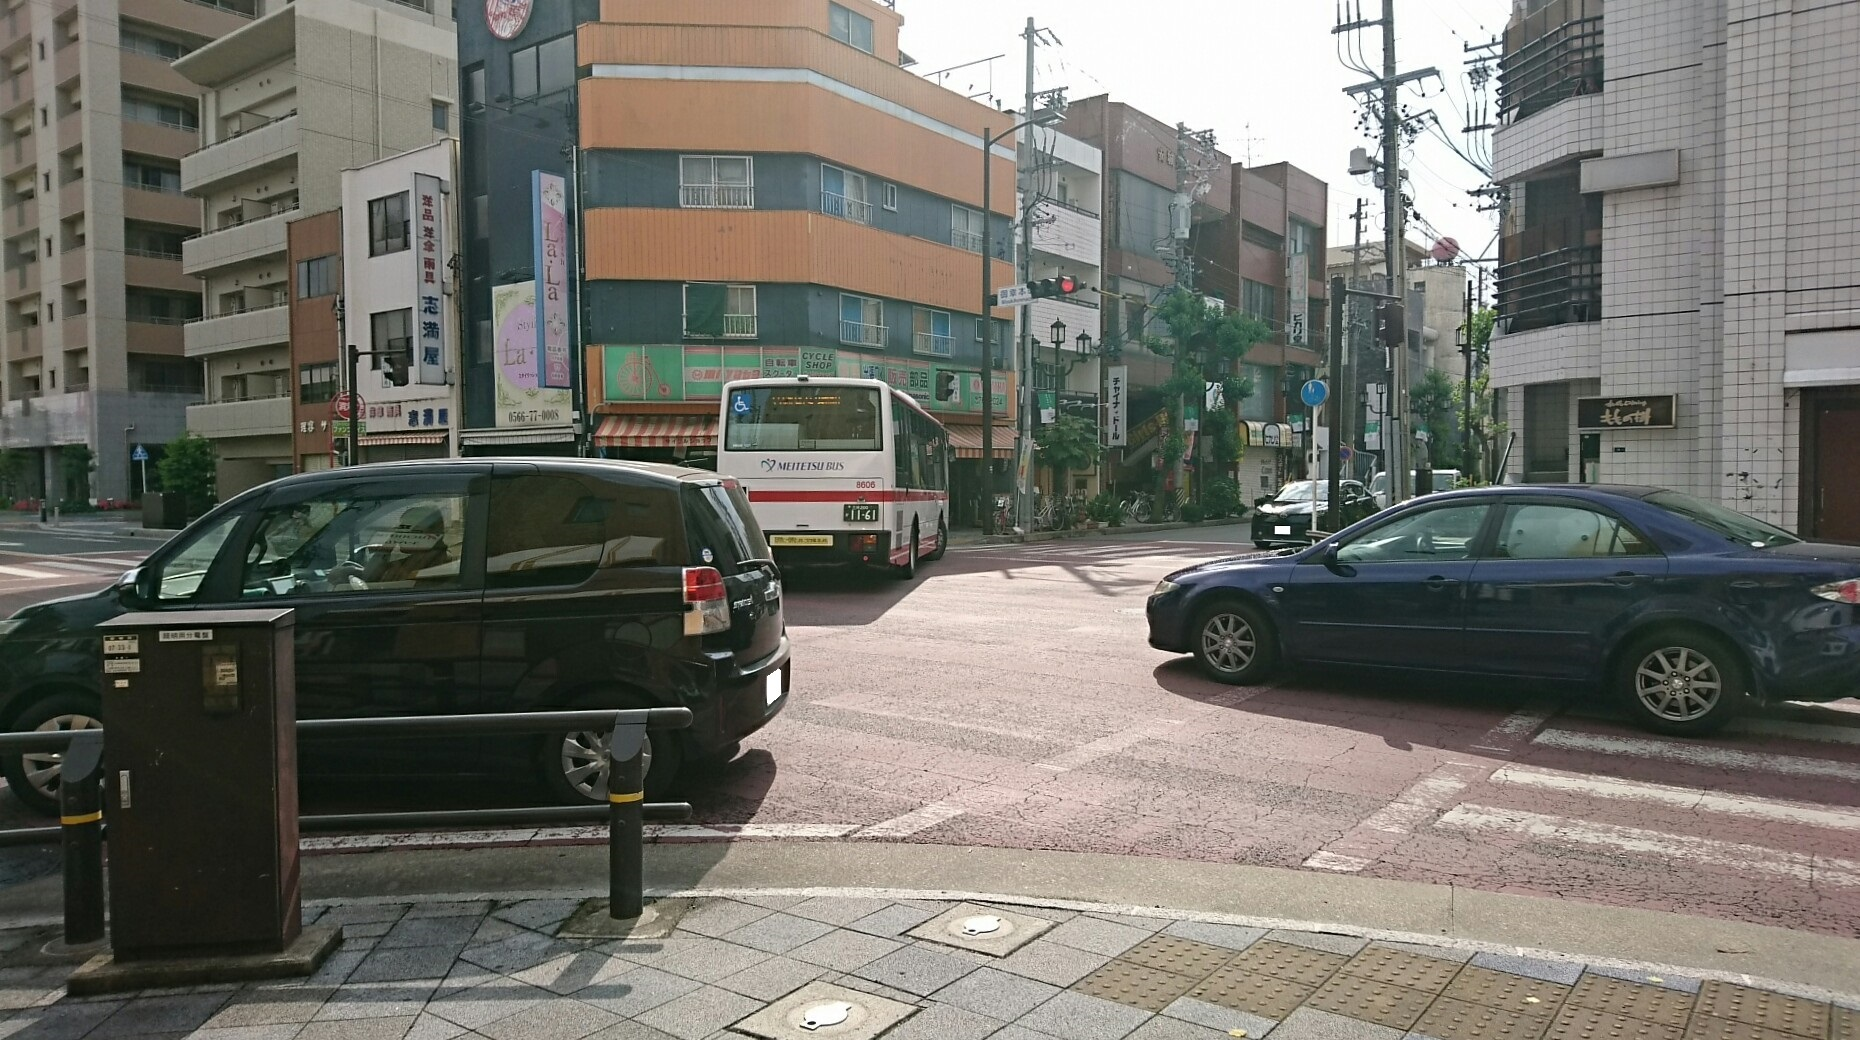 2017.6.2 名鉄バス (3) 御幸本町交差点 1860-1040